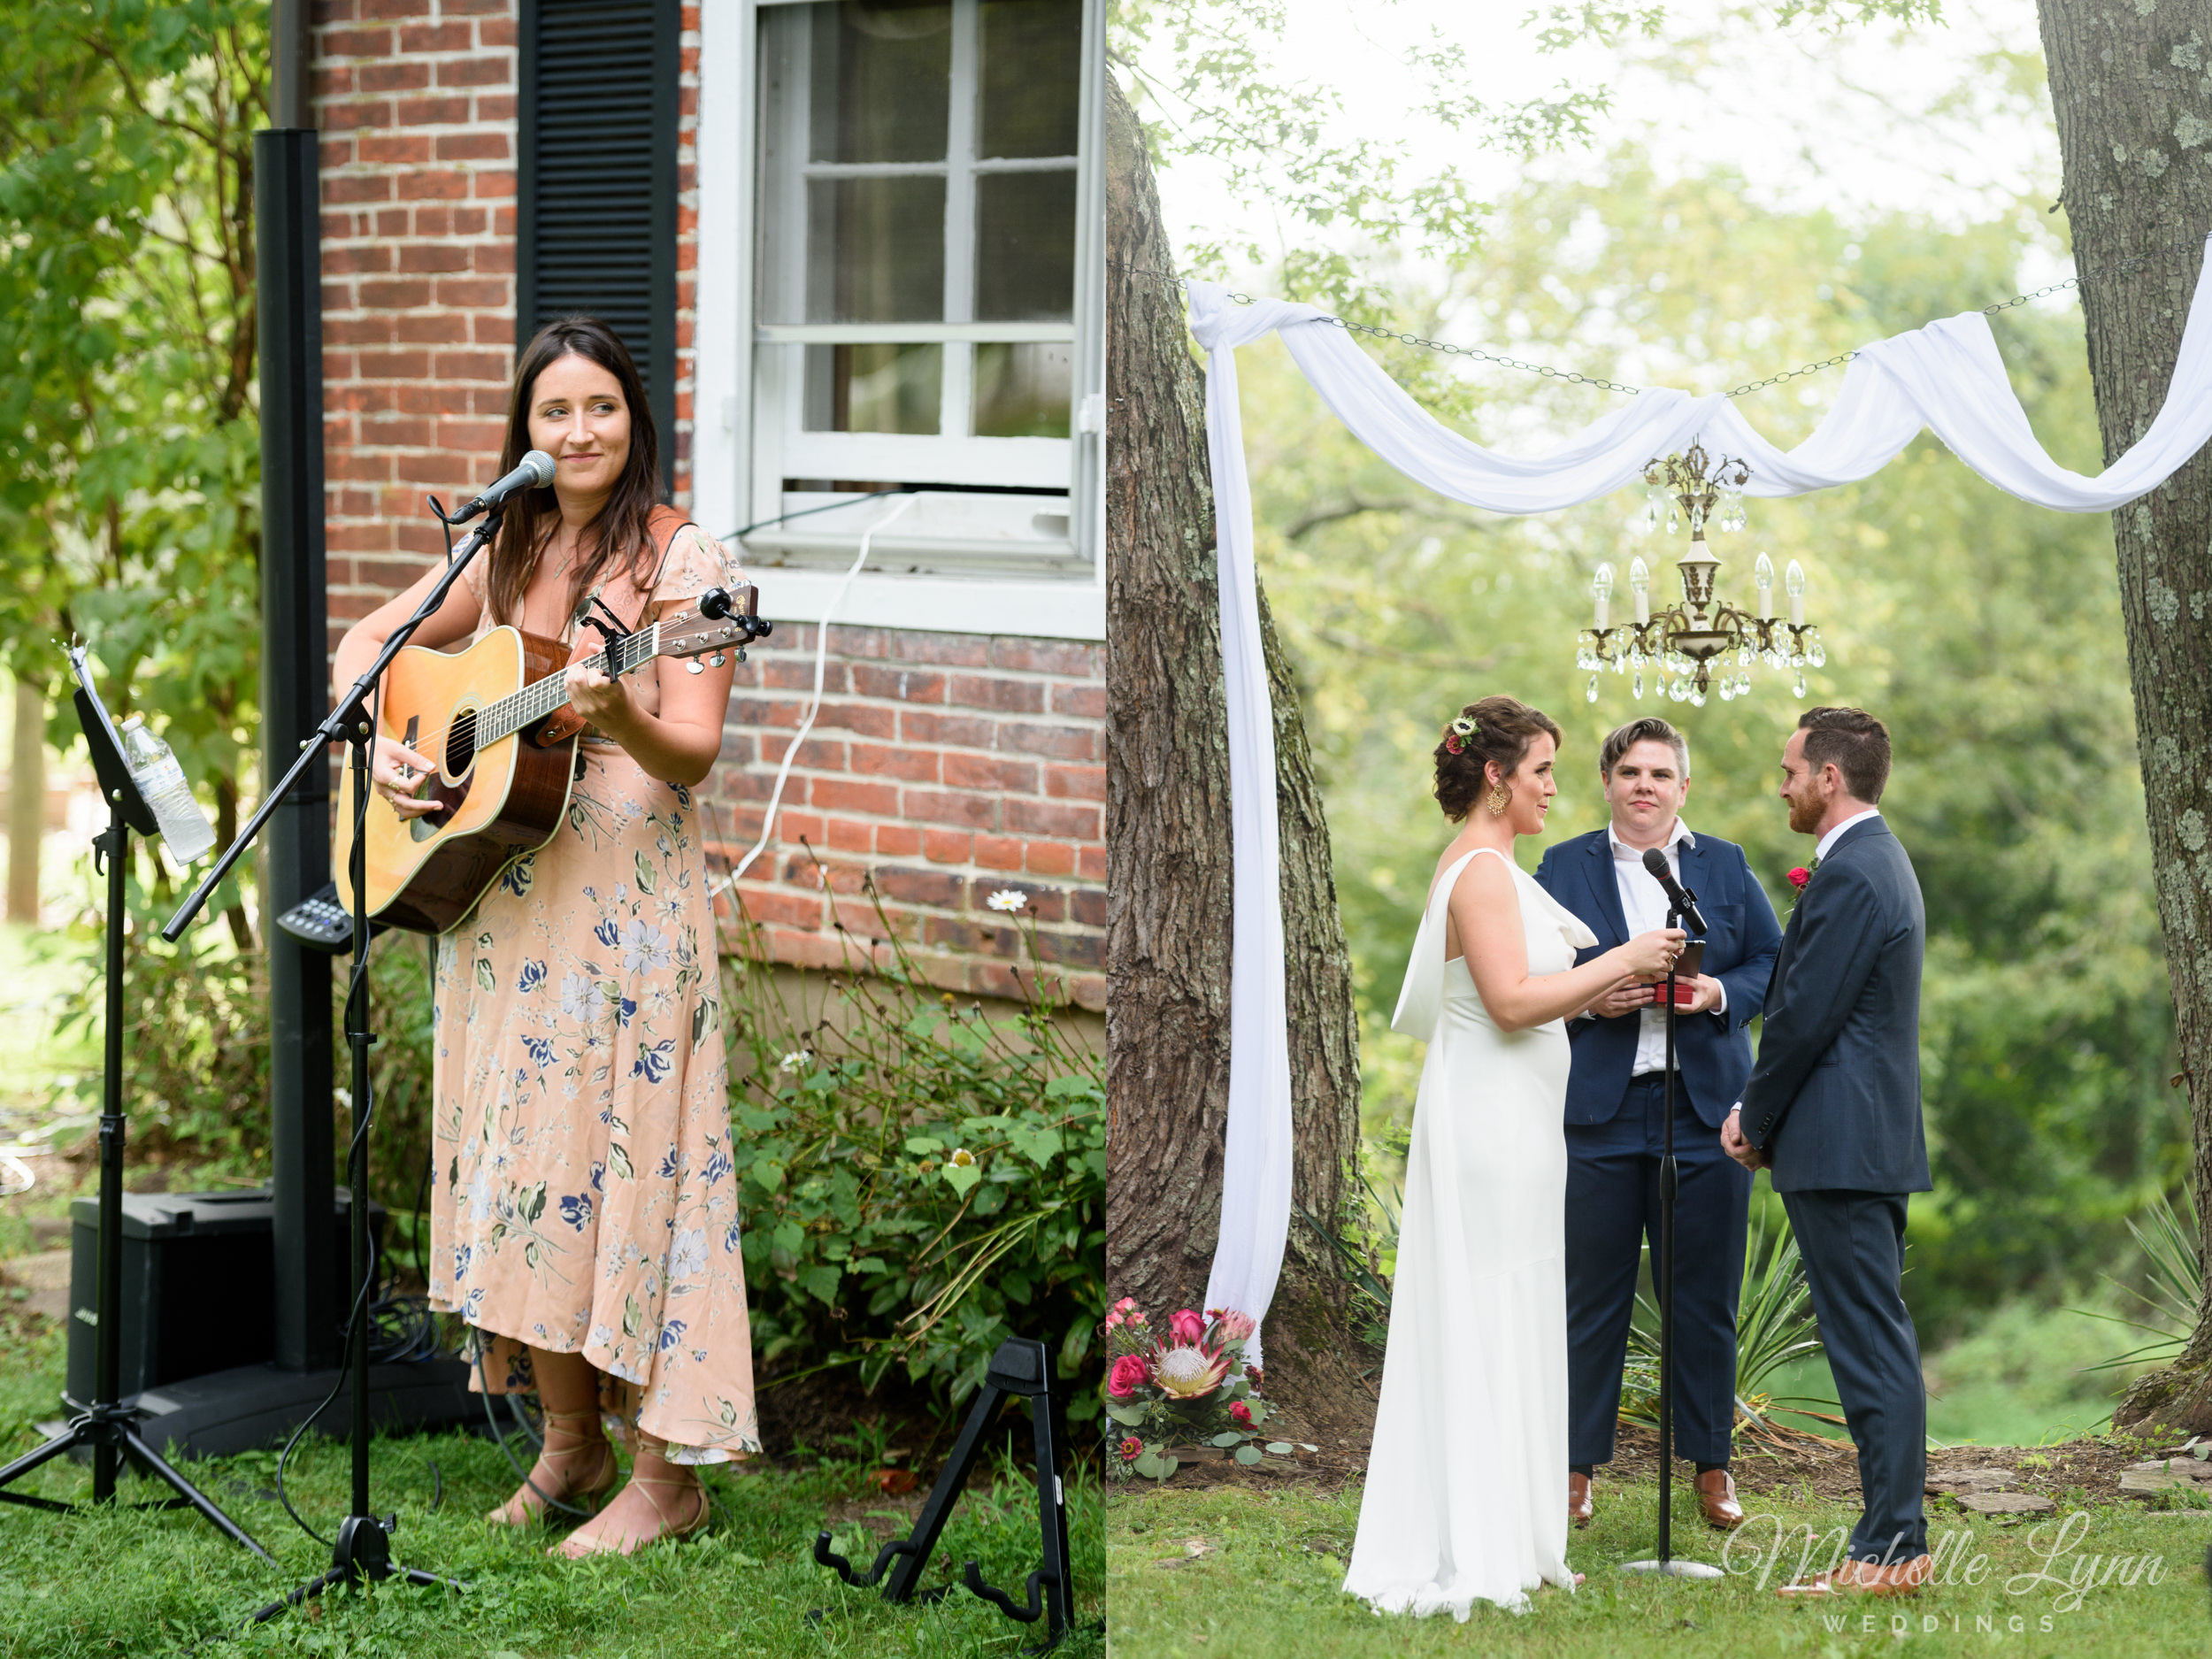 mlw-unionville-vineyards-nj-wedding-photography-36.jpg